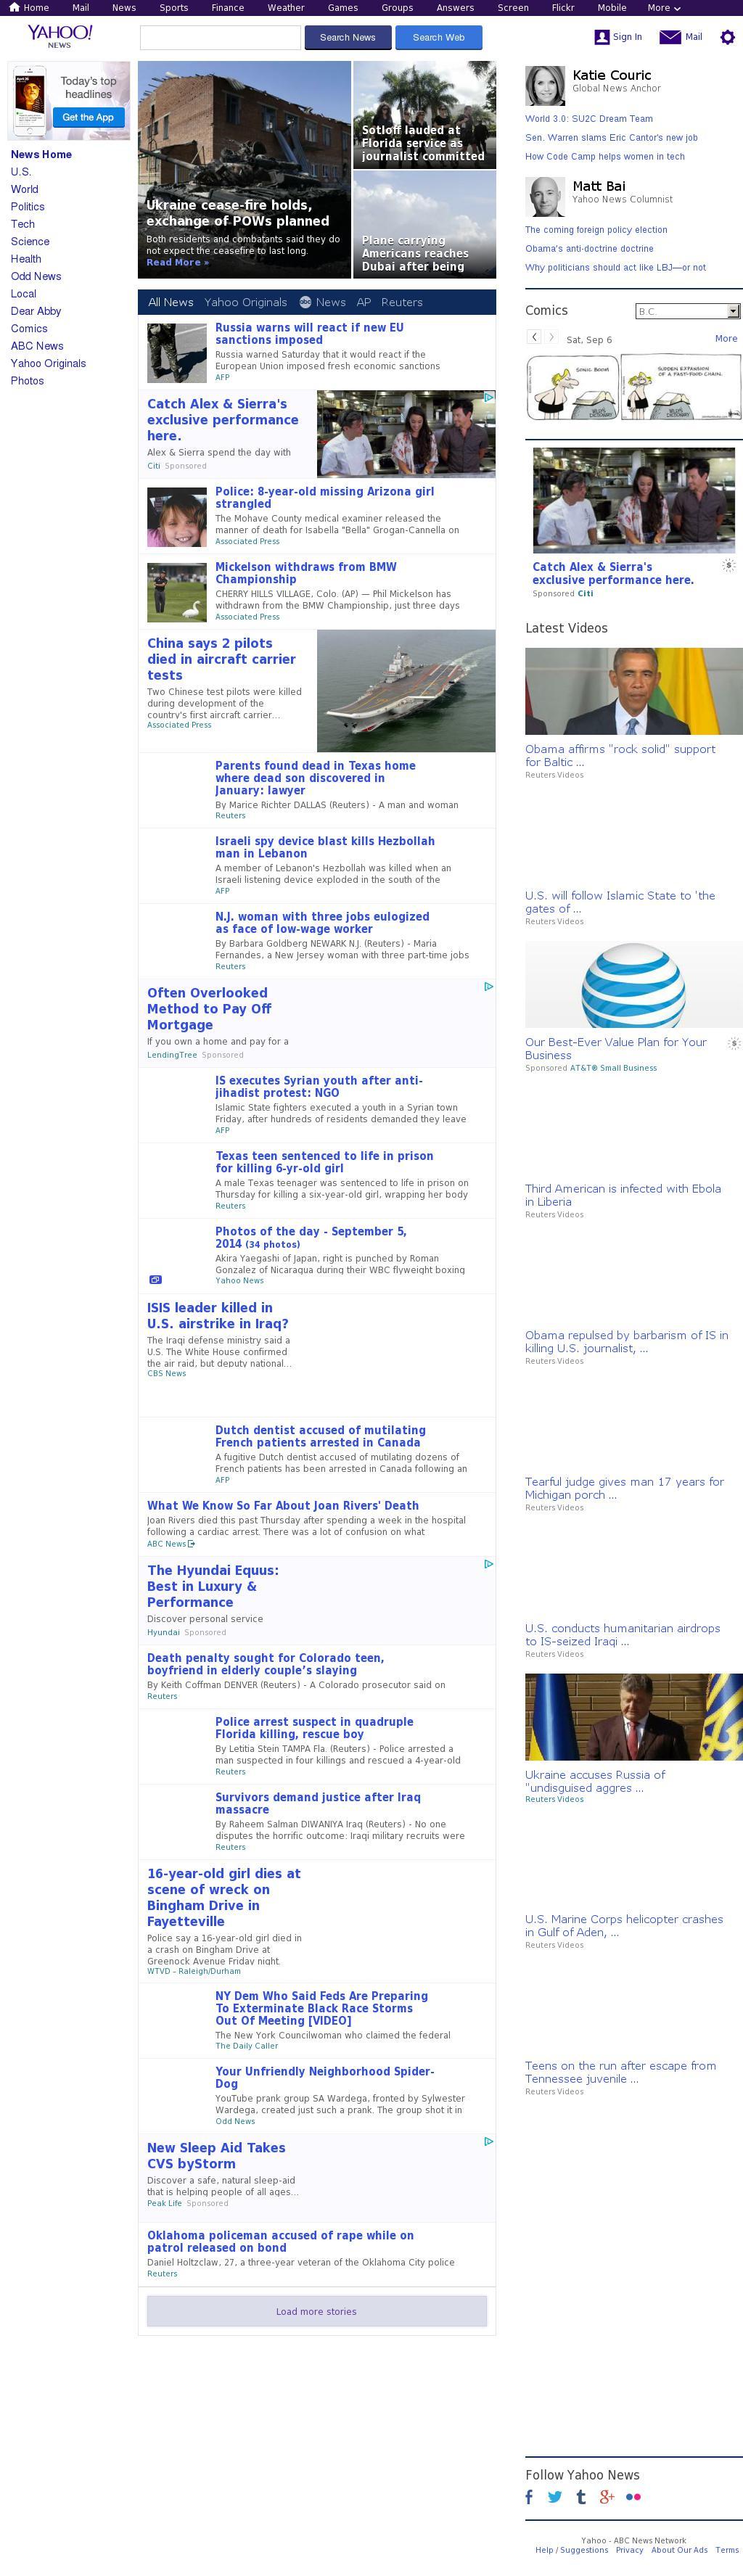 Yahoo! News at Saturday Sept. 6, 2014, 2:17 p.m. UTC